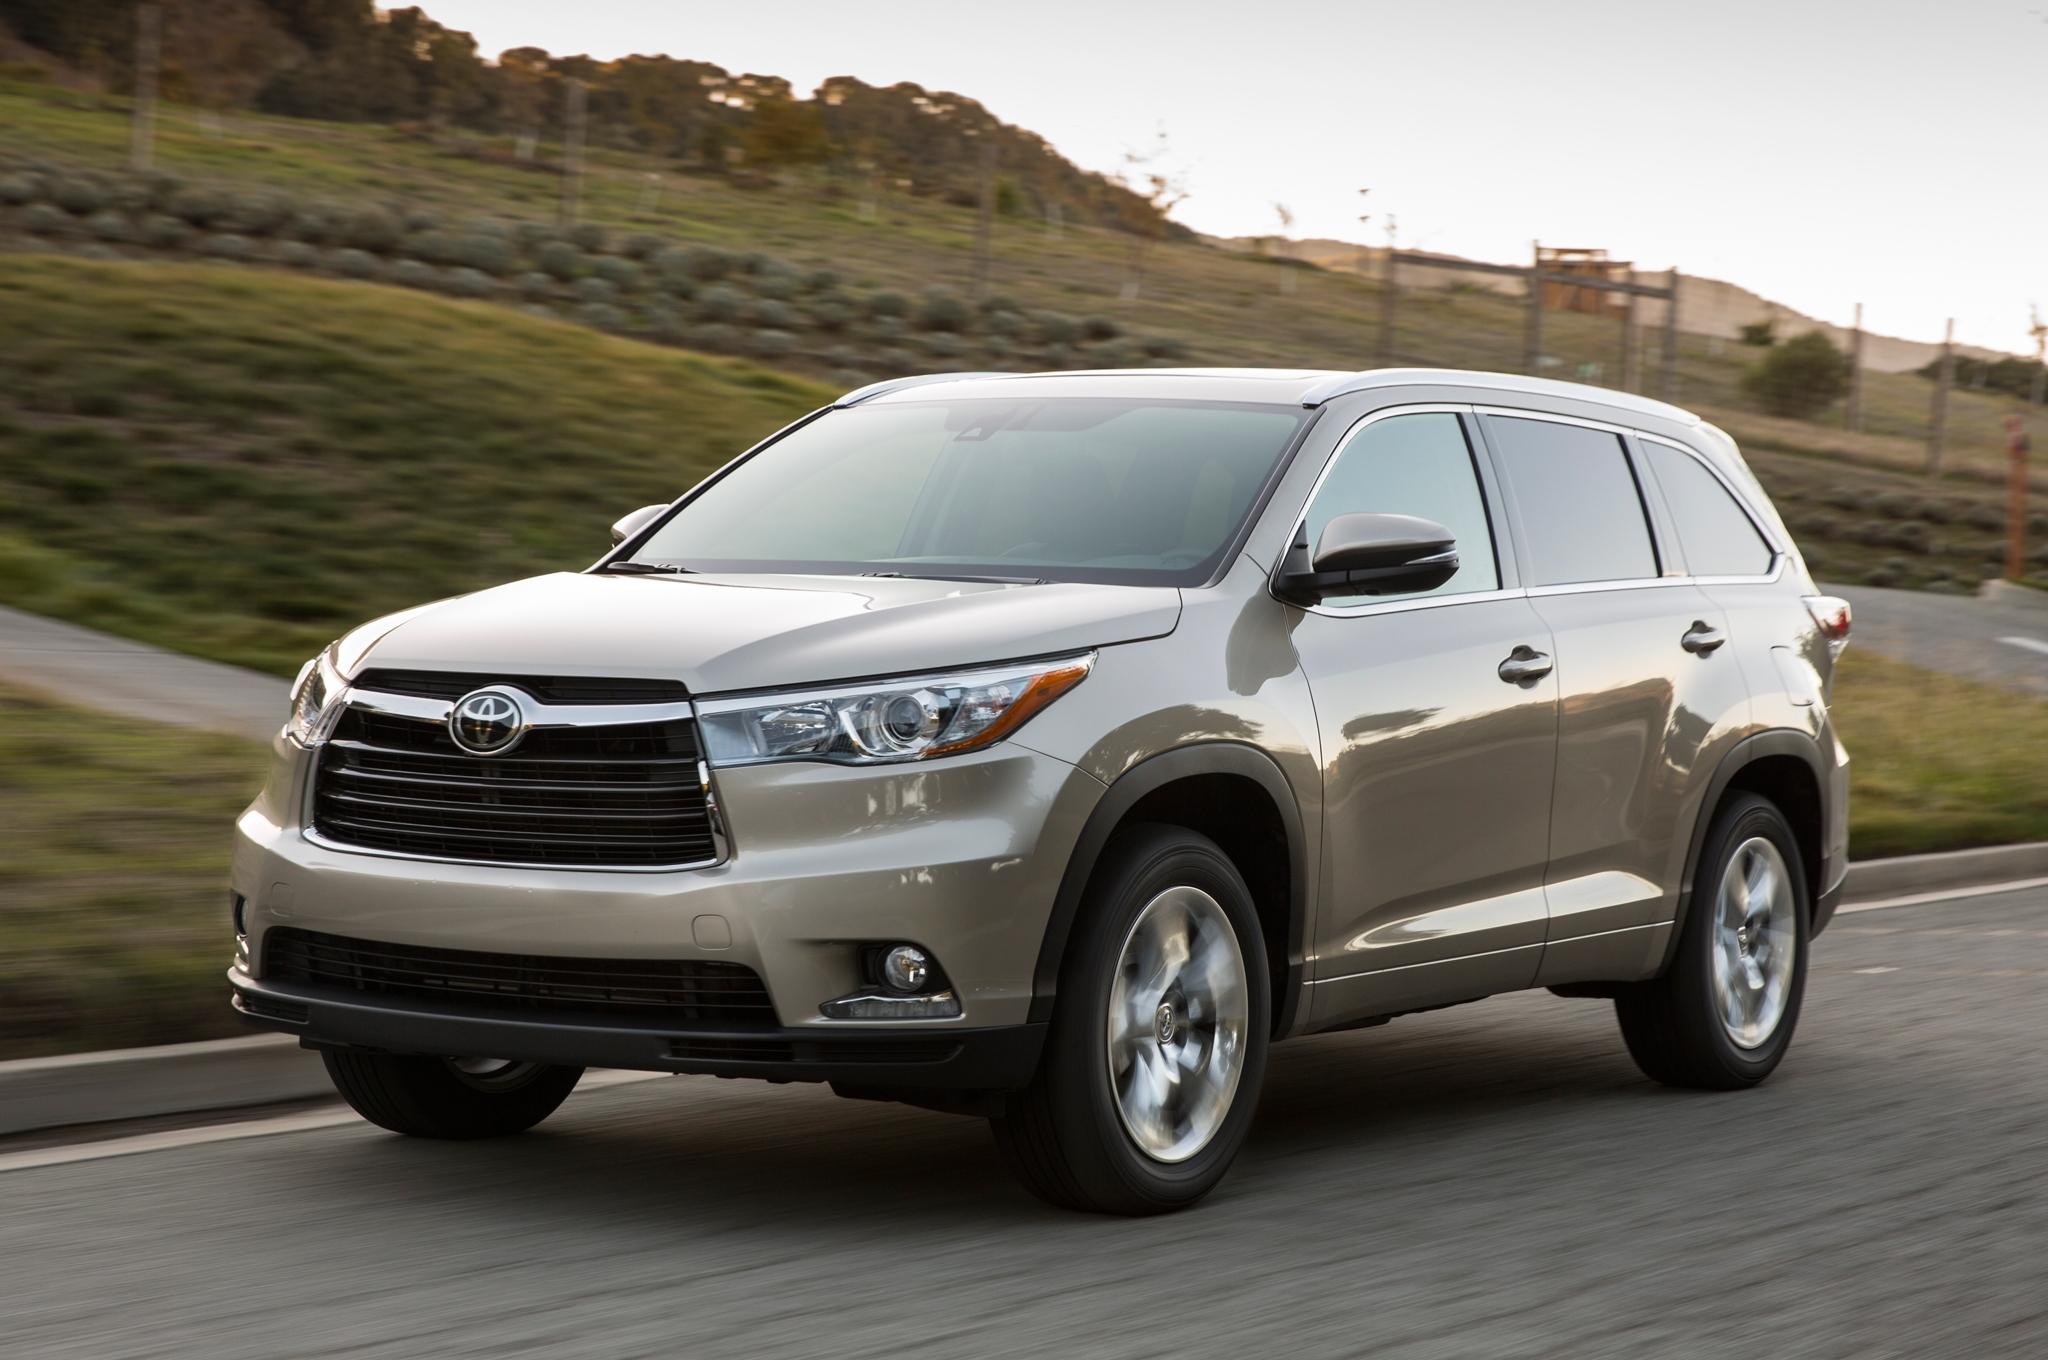 2016 Toyota Highlander Recalled Due To Potential Braking